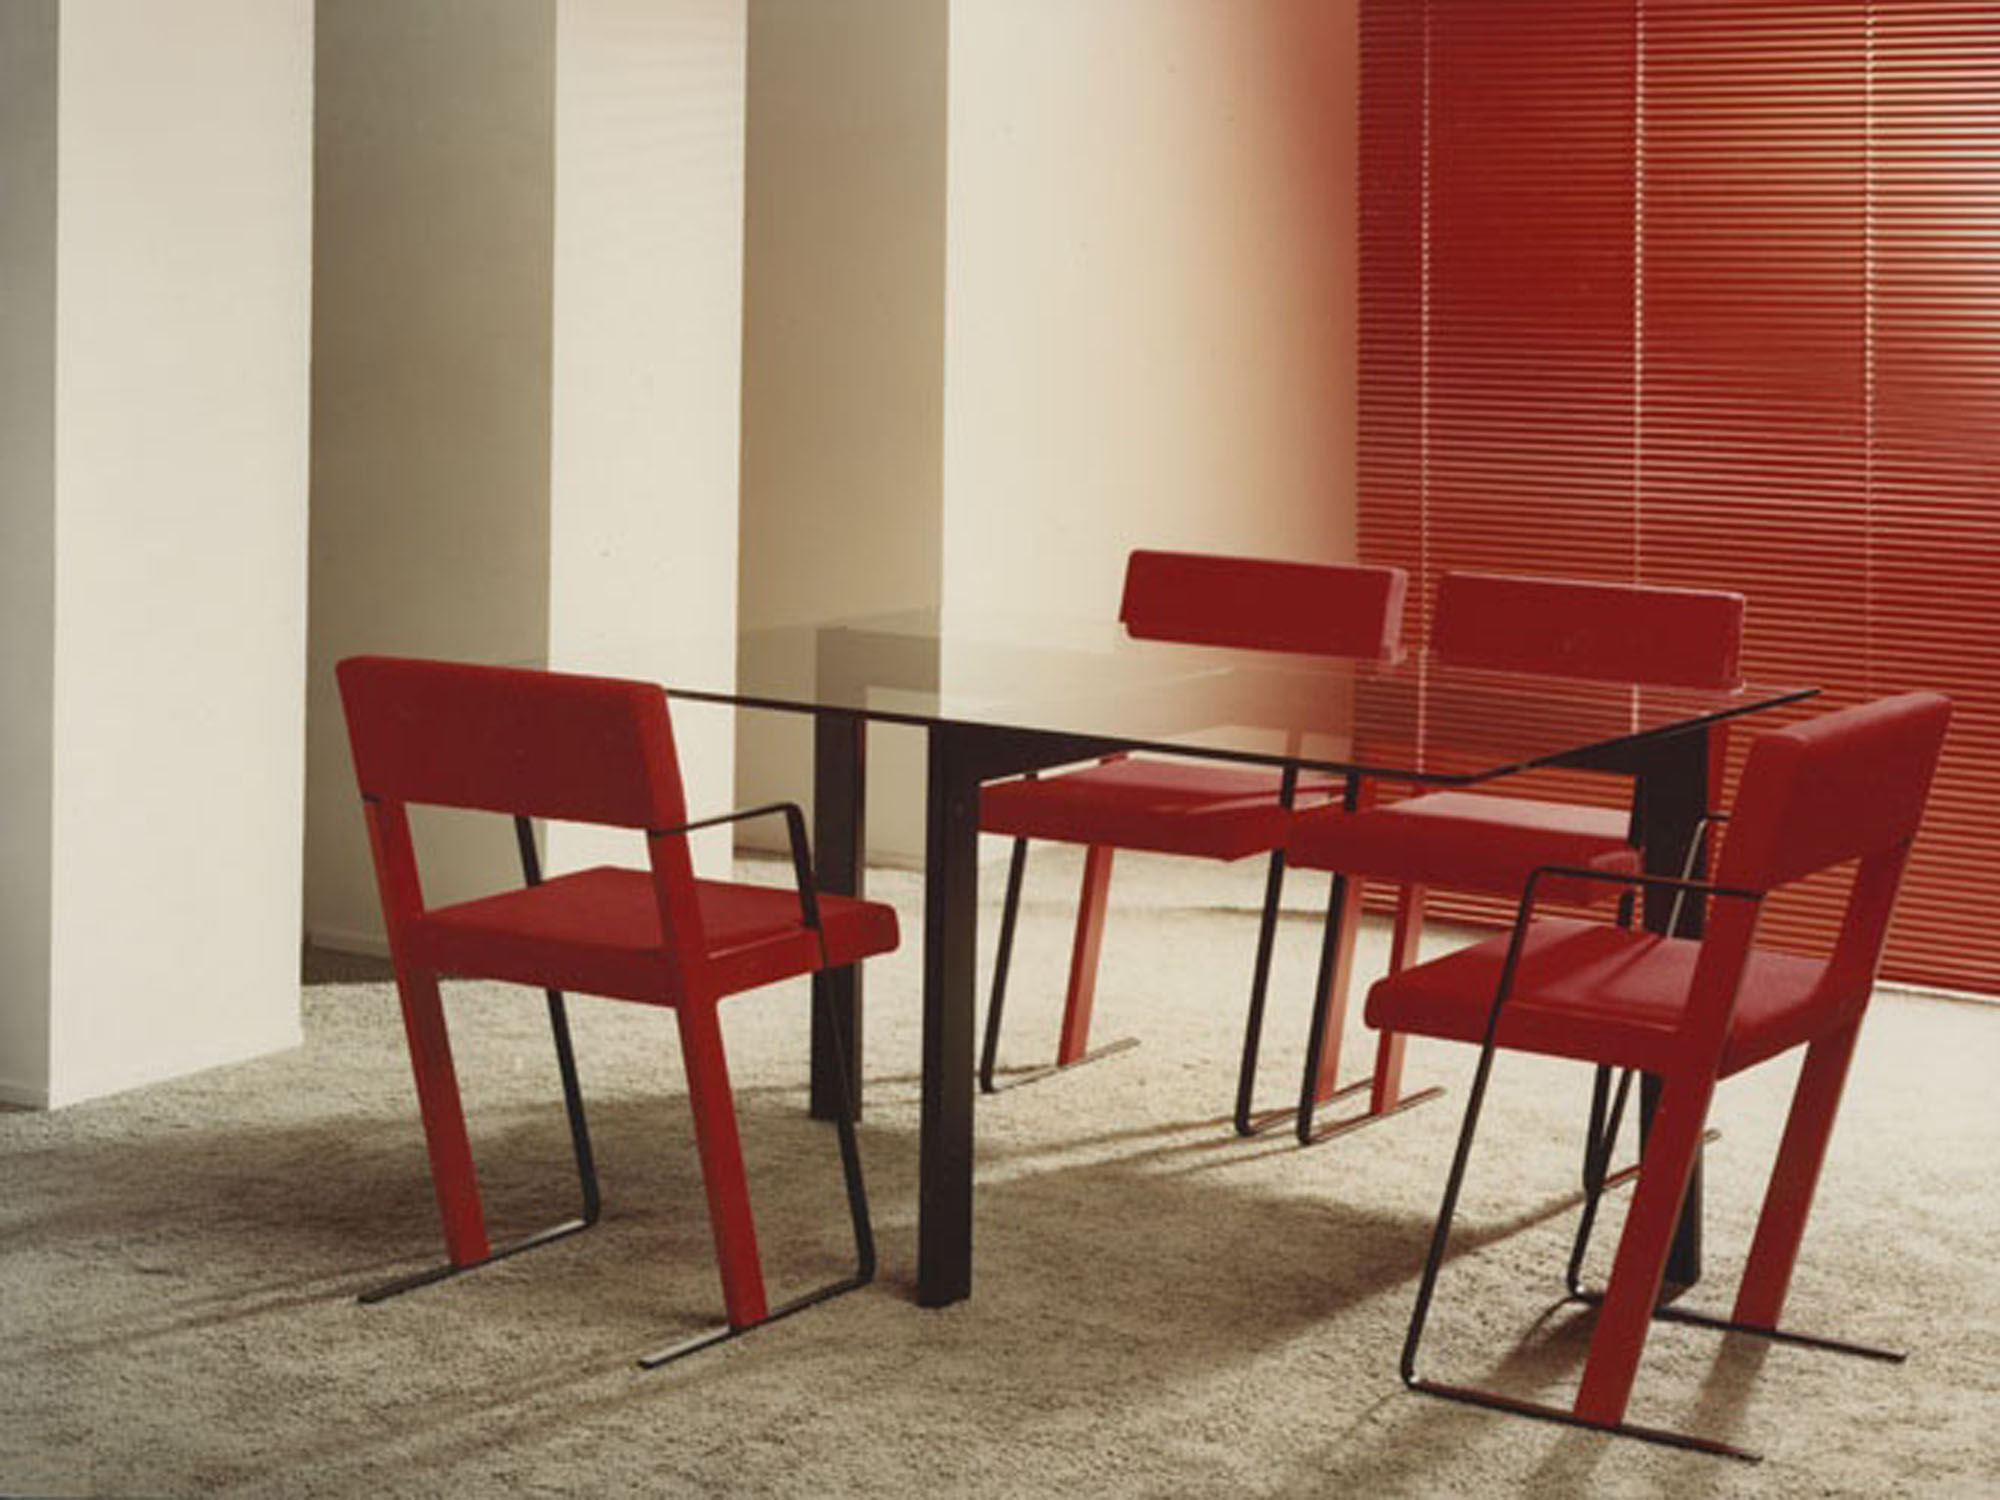 Castelijn Collection classic, tafel TG en stoelen SDC